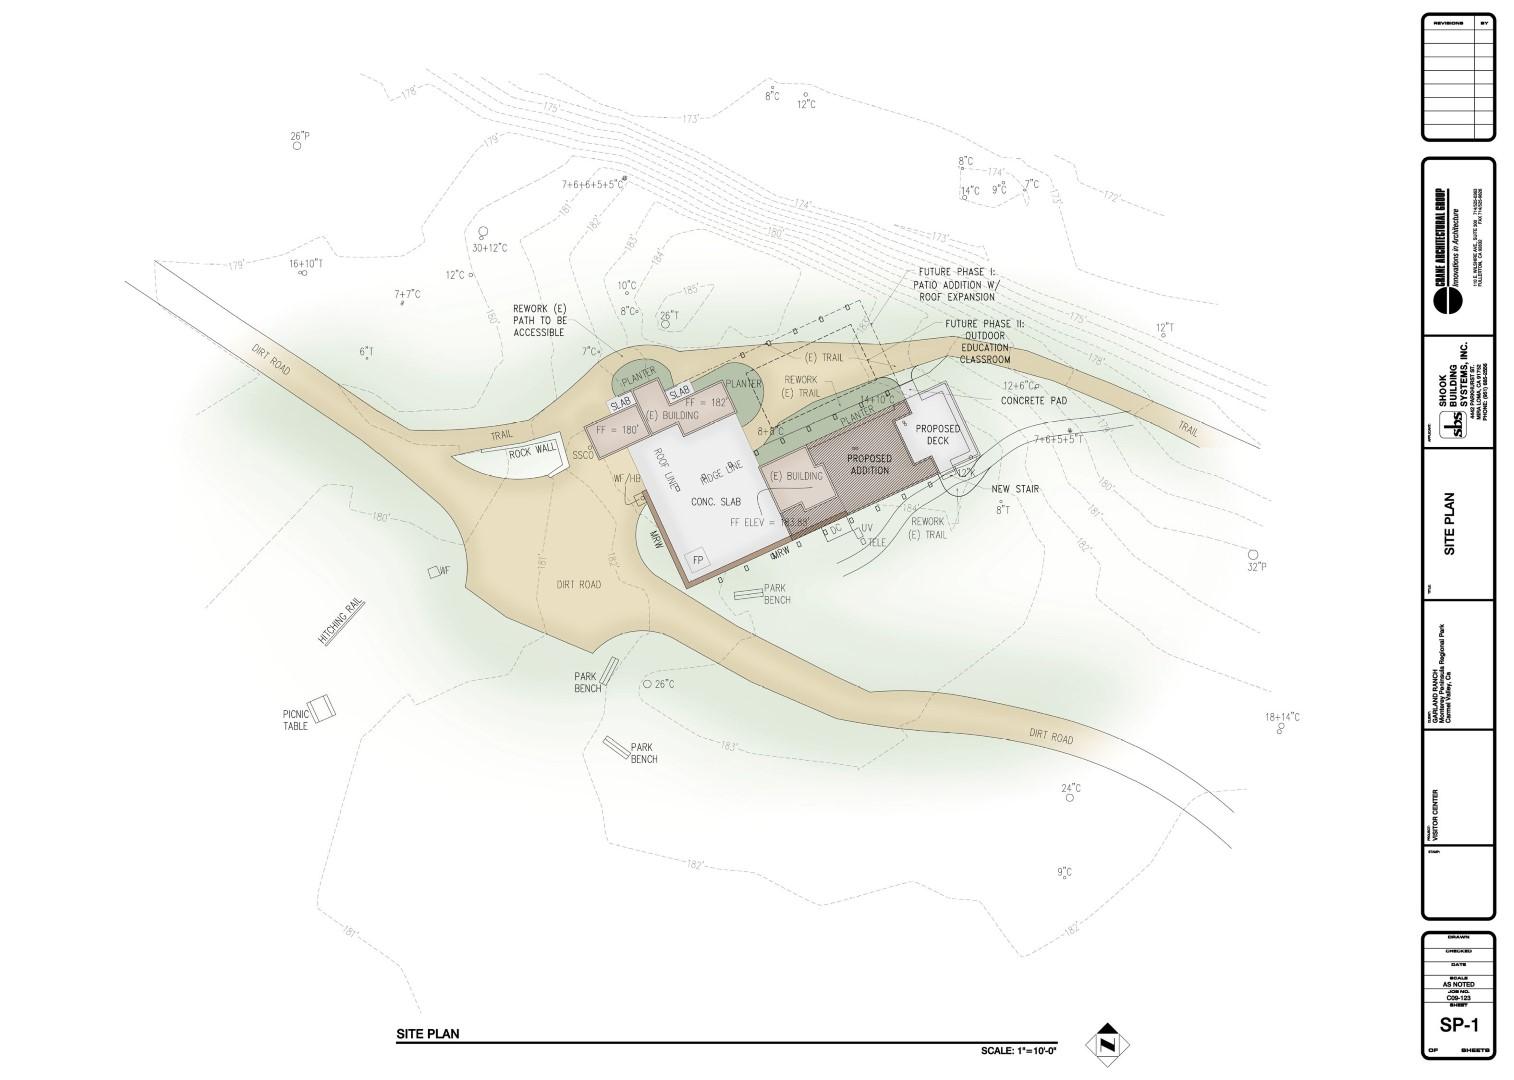 SP-1 Site Plan 1